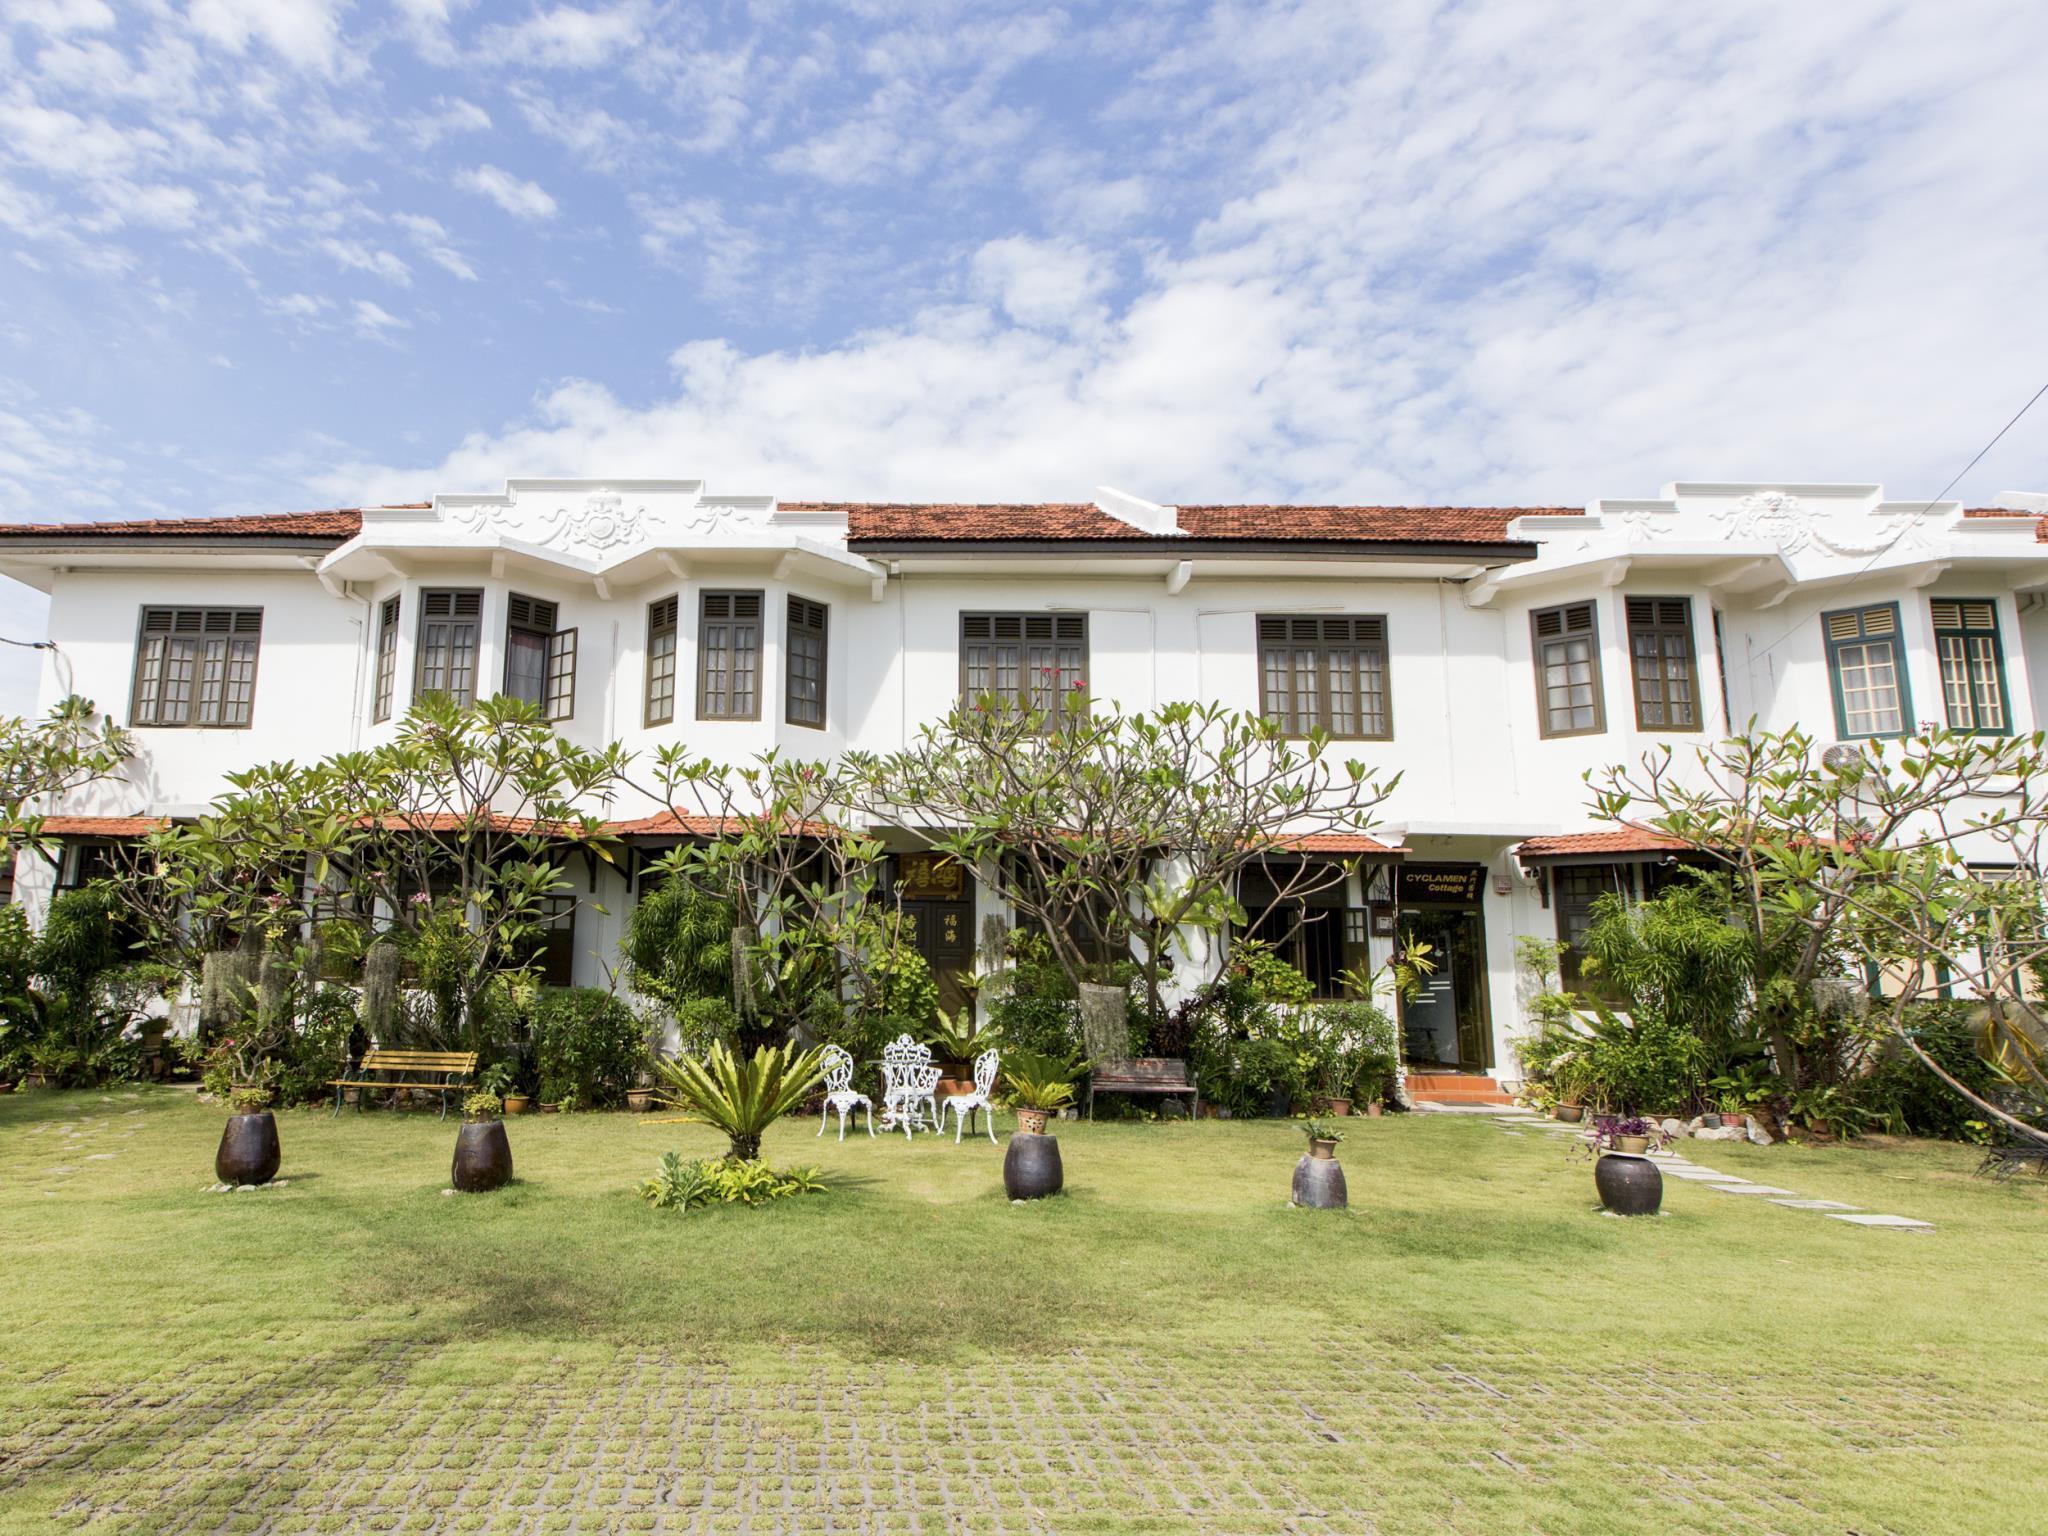 Cyclamen Cottage, Kota Melaka